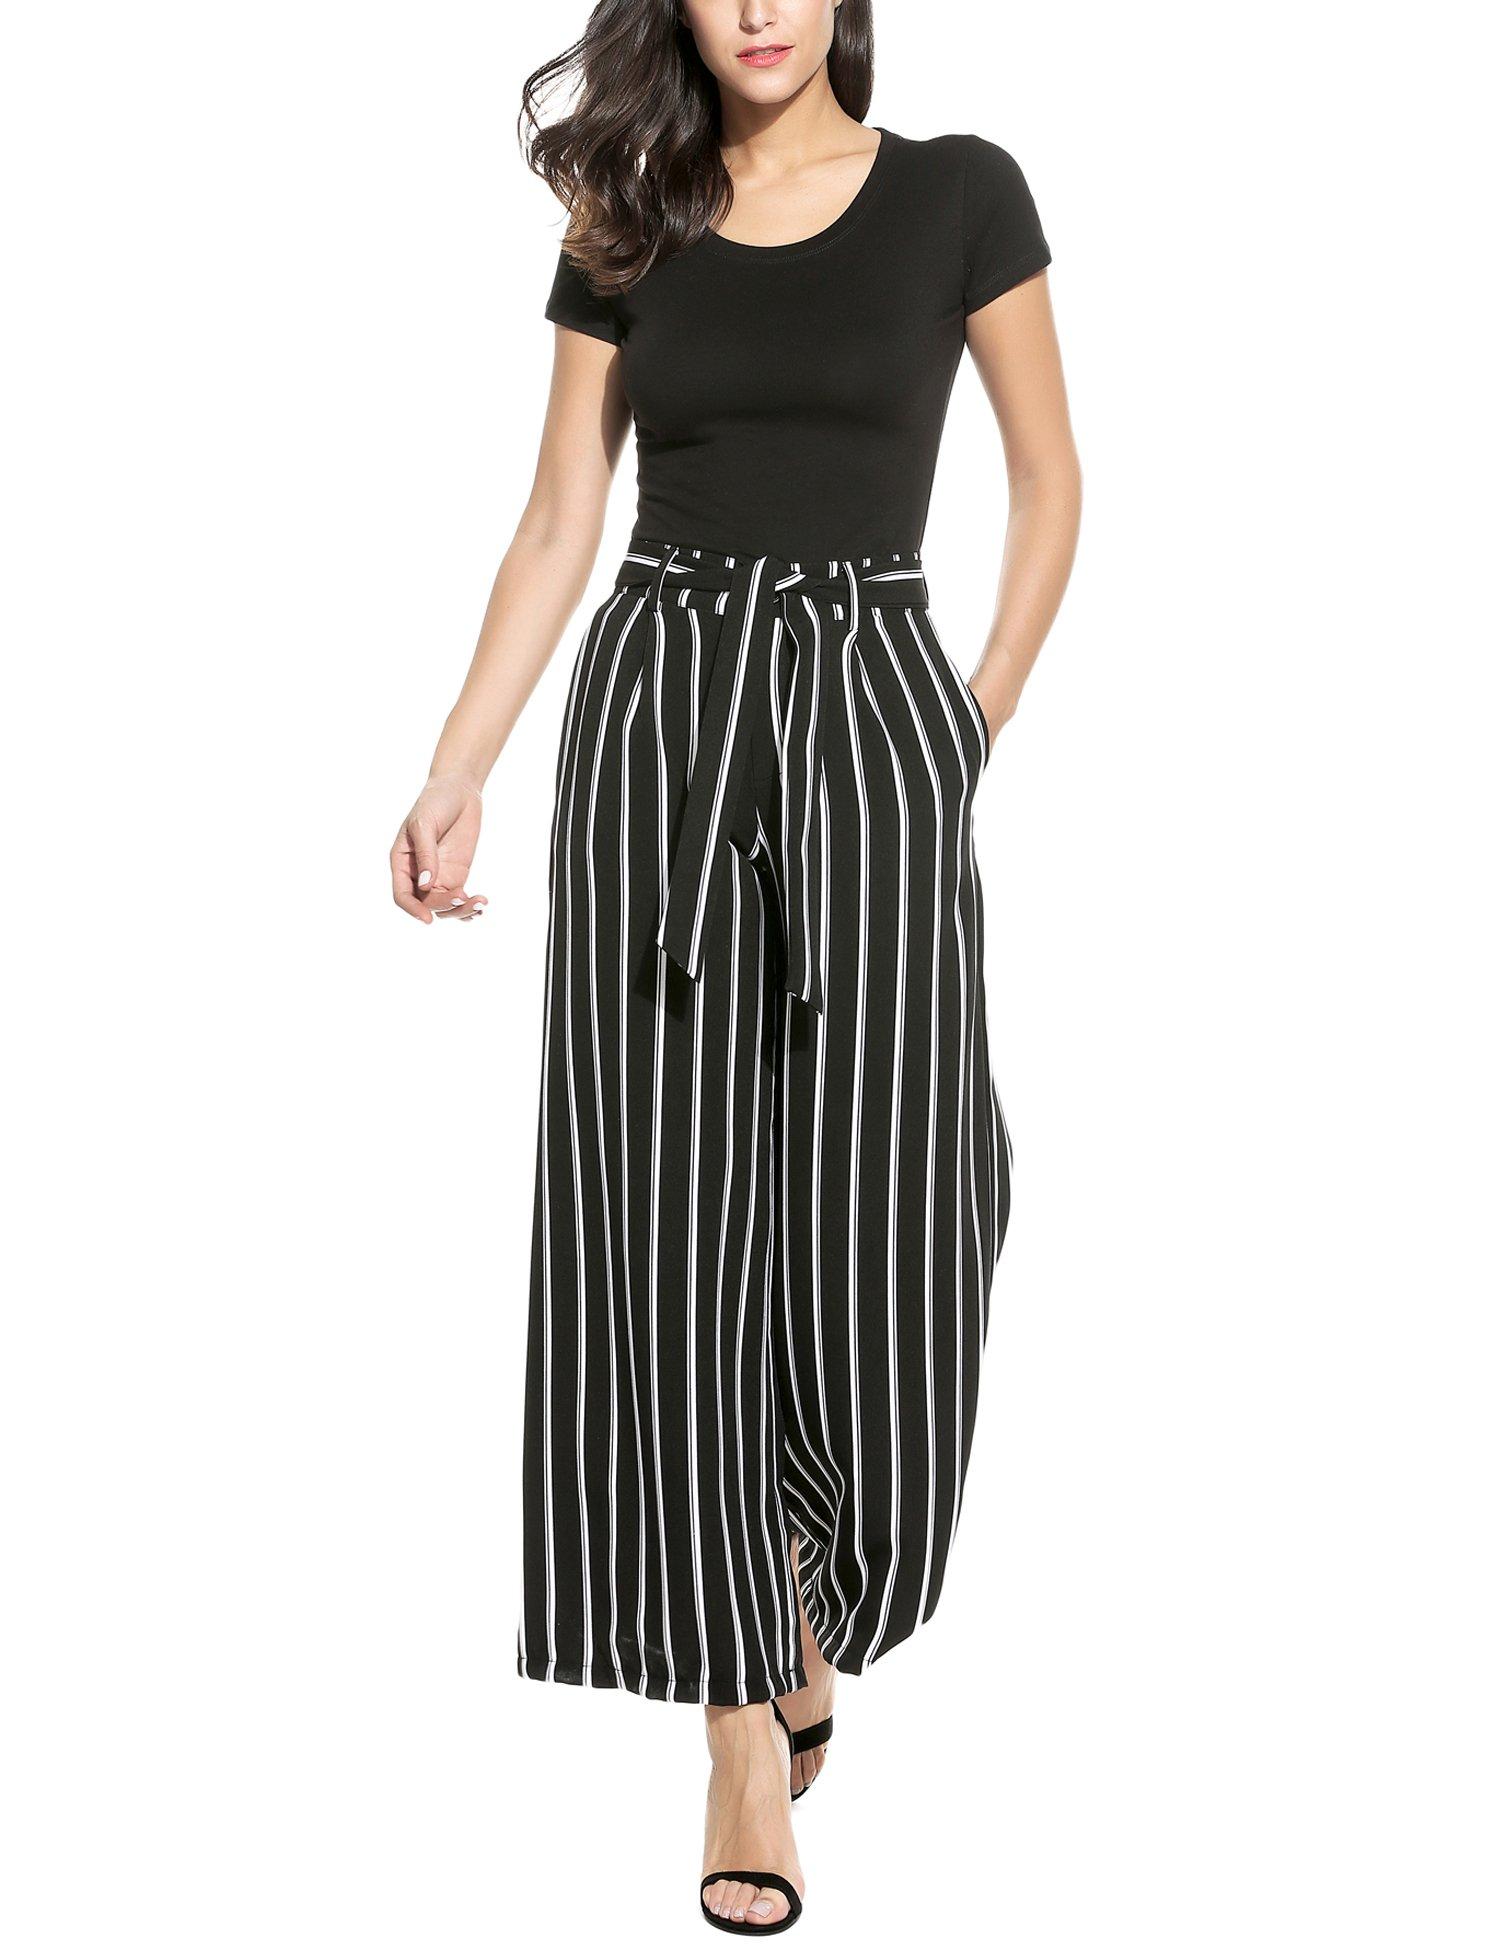 Zeagoo Women's Super Comfy Stripe Flowy Wide Leg High Waist Belted Palazzo Pants,Black,Large